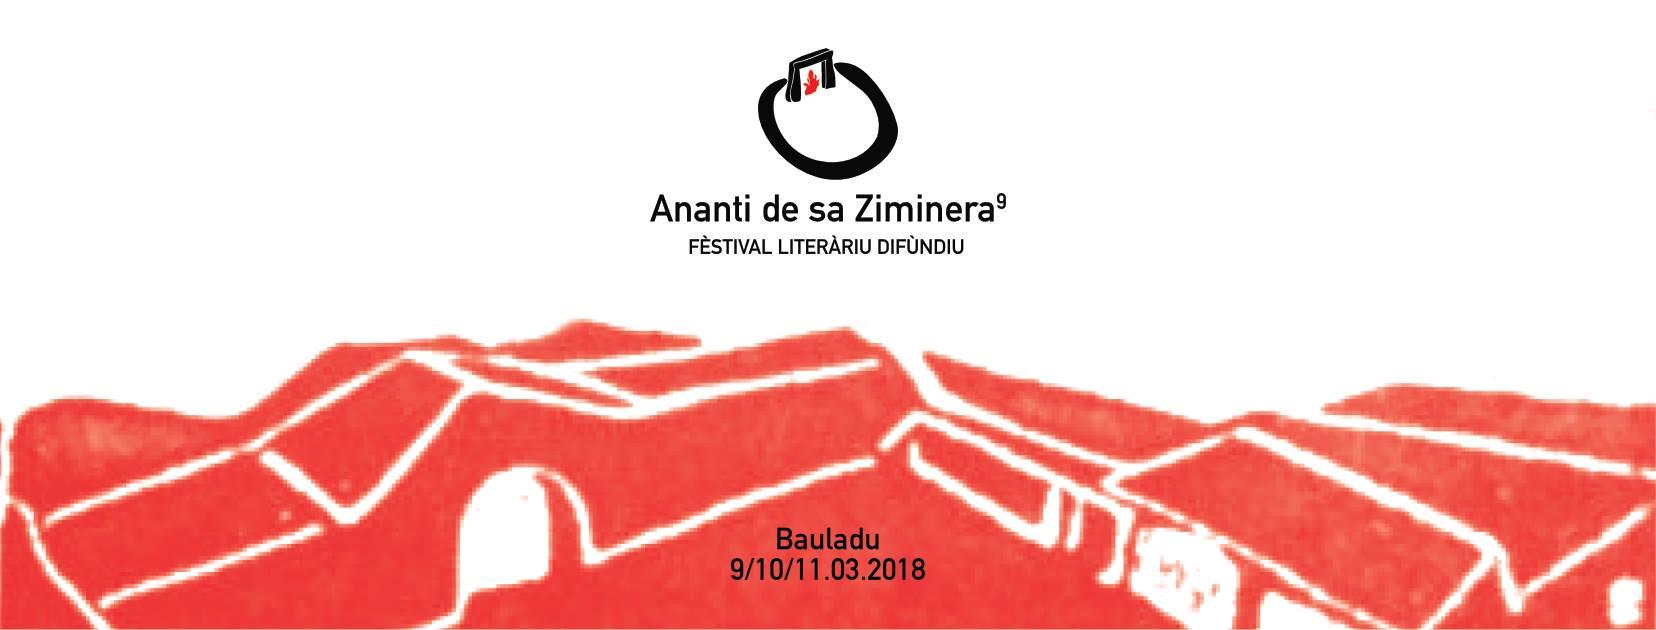 Ananti de sa Ziminera - IX ediz. Festival Literariu Difùndiu